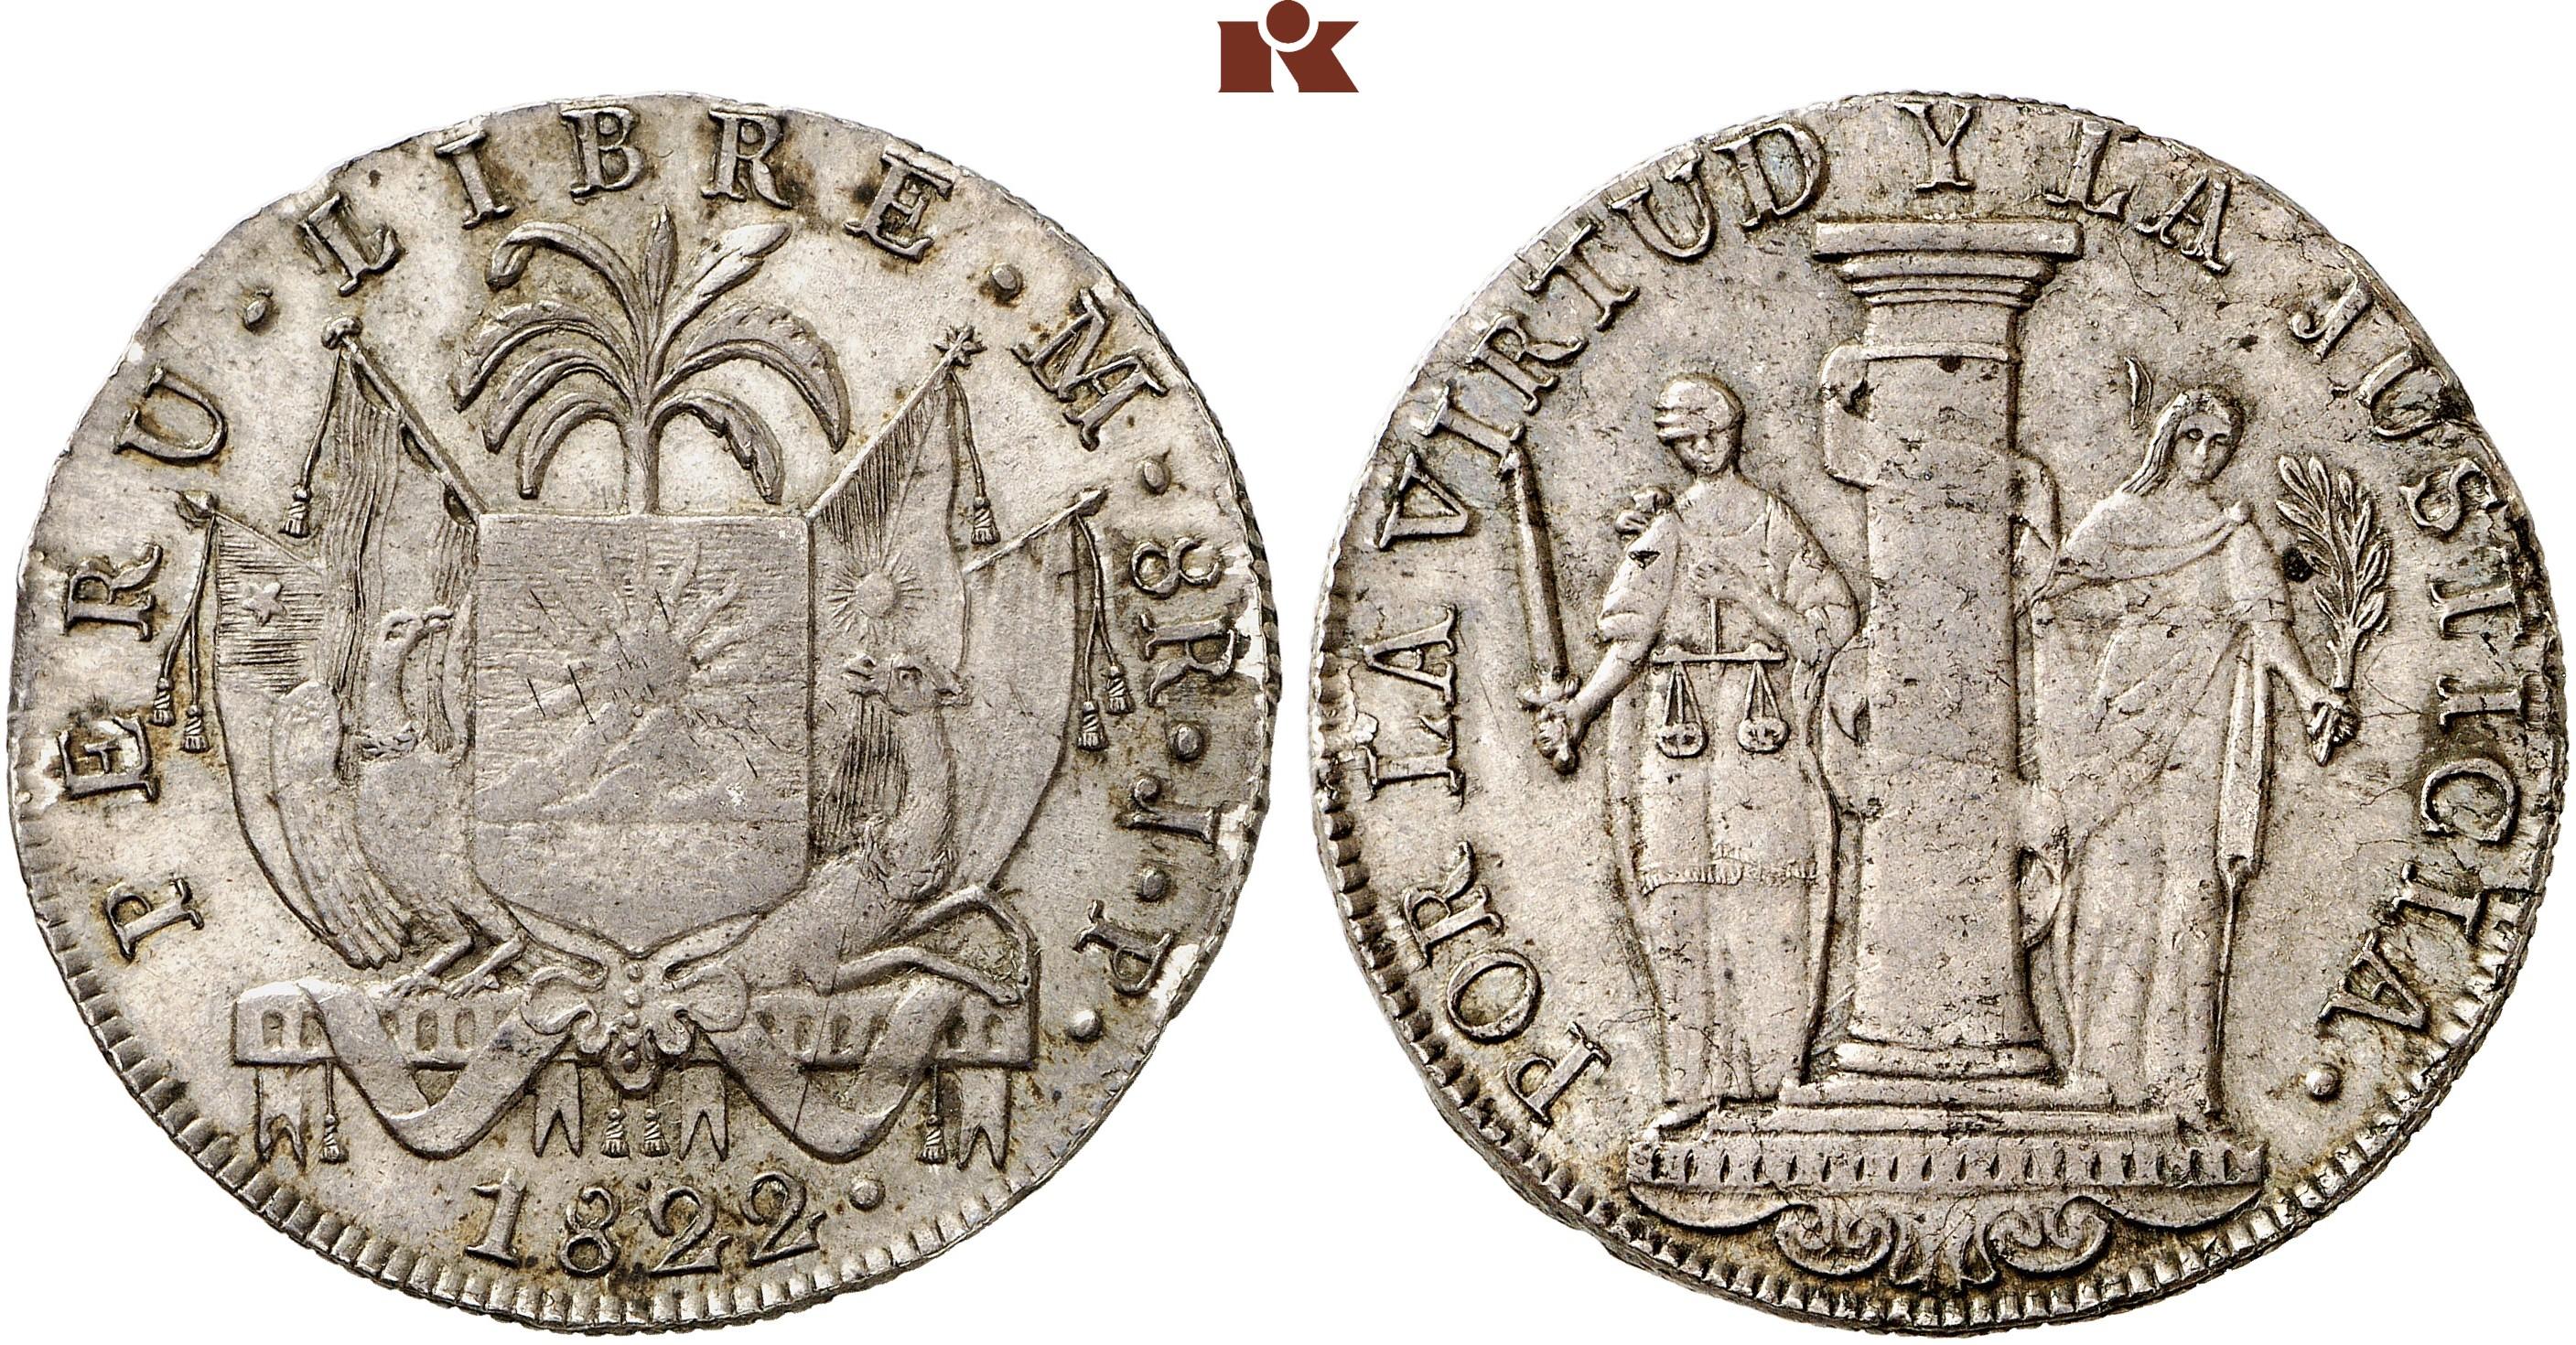 Republik Seit 1822 8 Reales 1822 Jp Lima 2765 G Grunthal